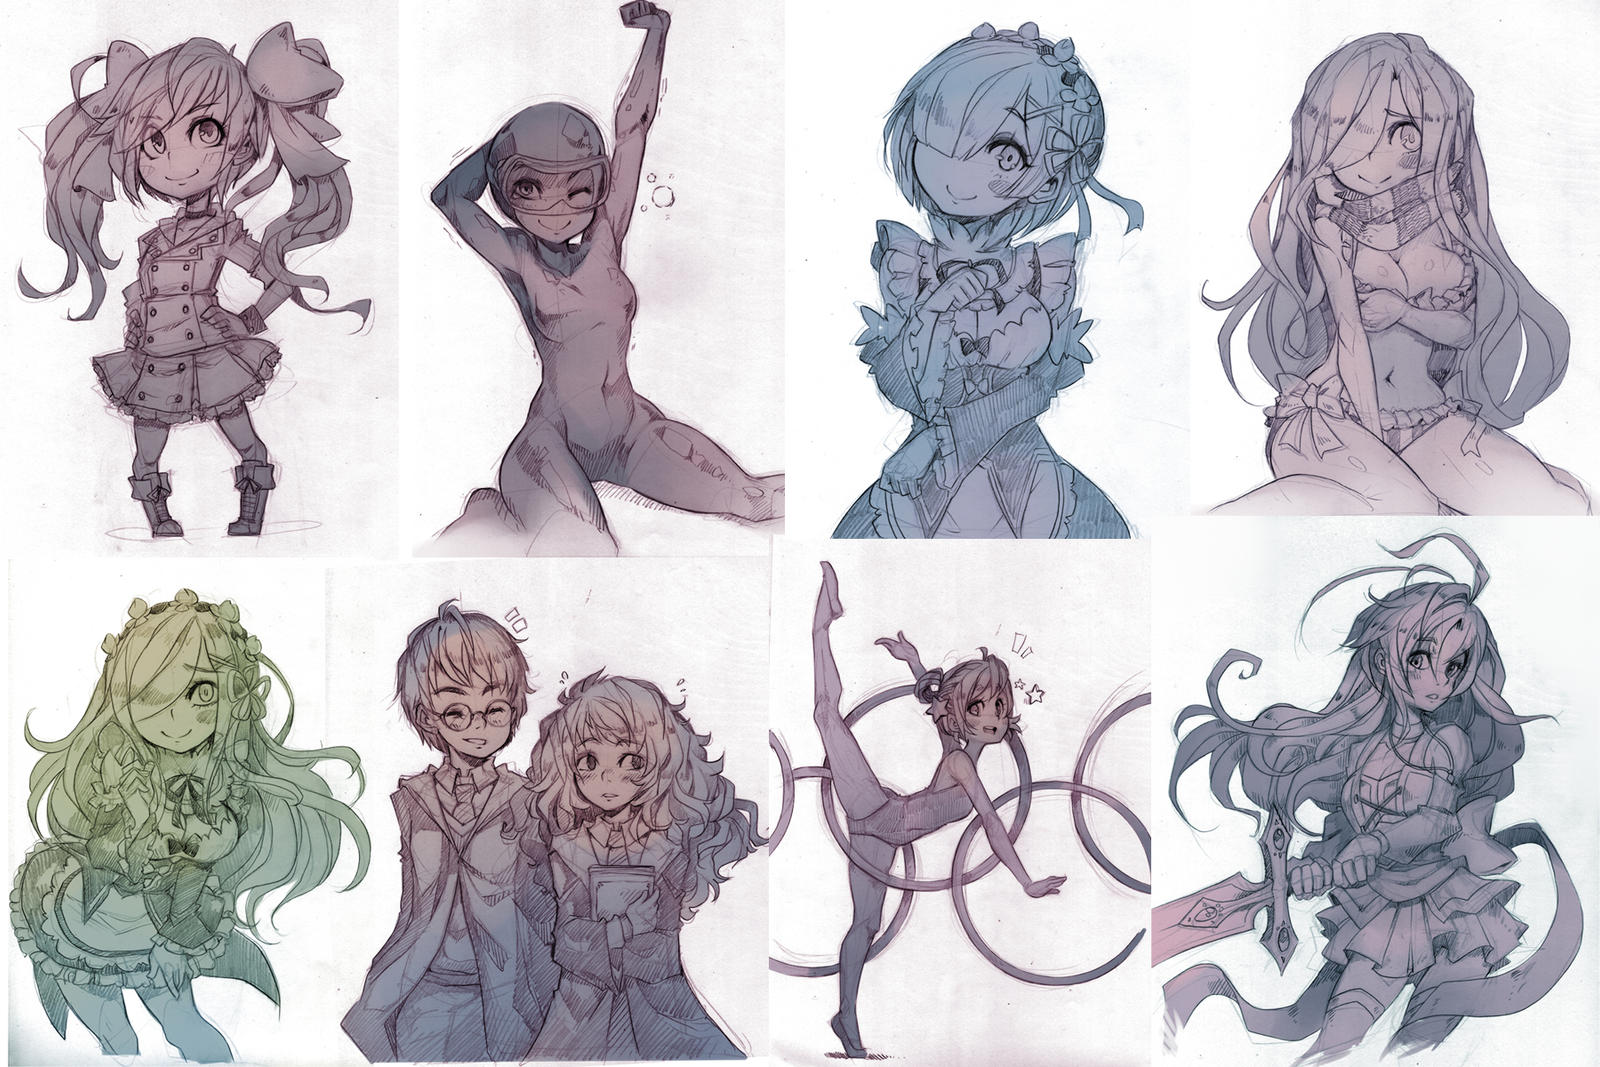 More Patreon Sketches by Parororo